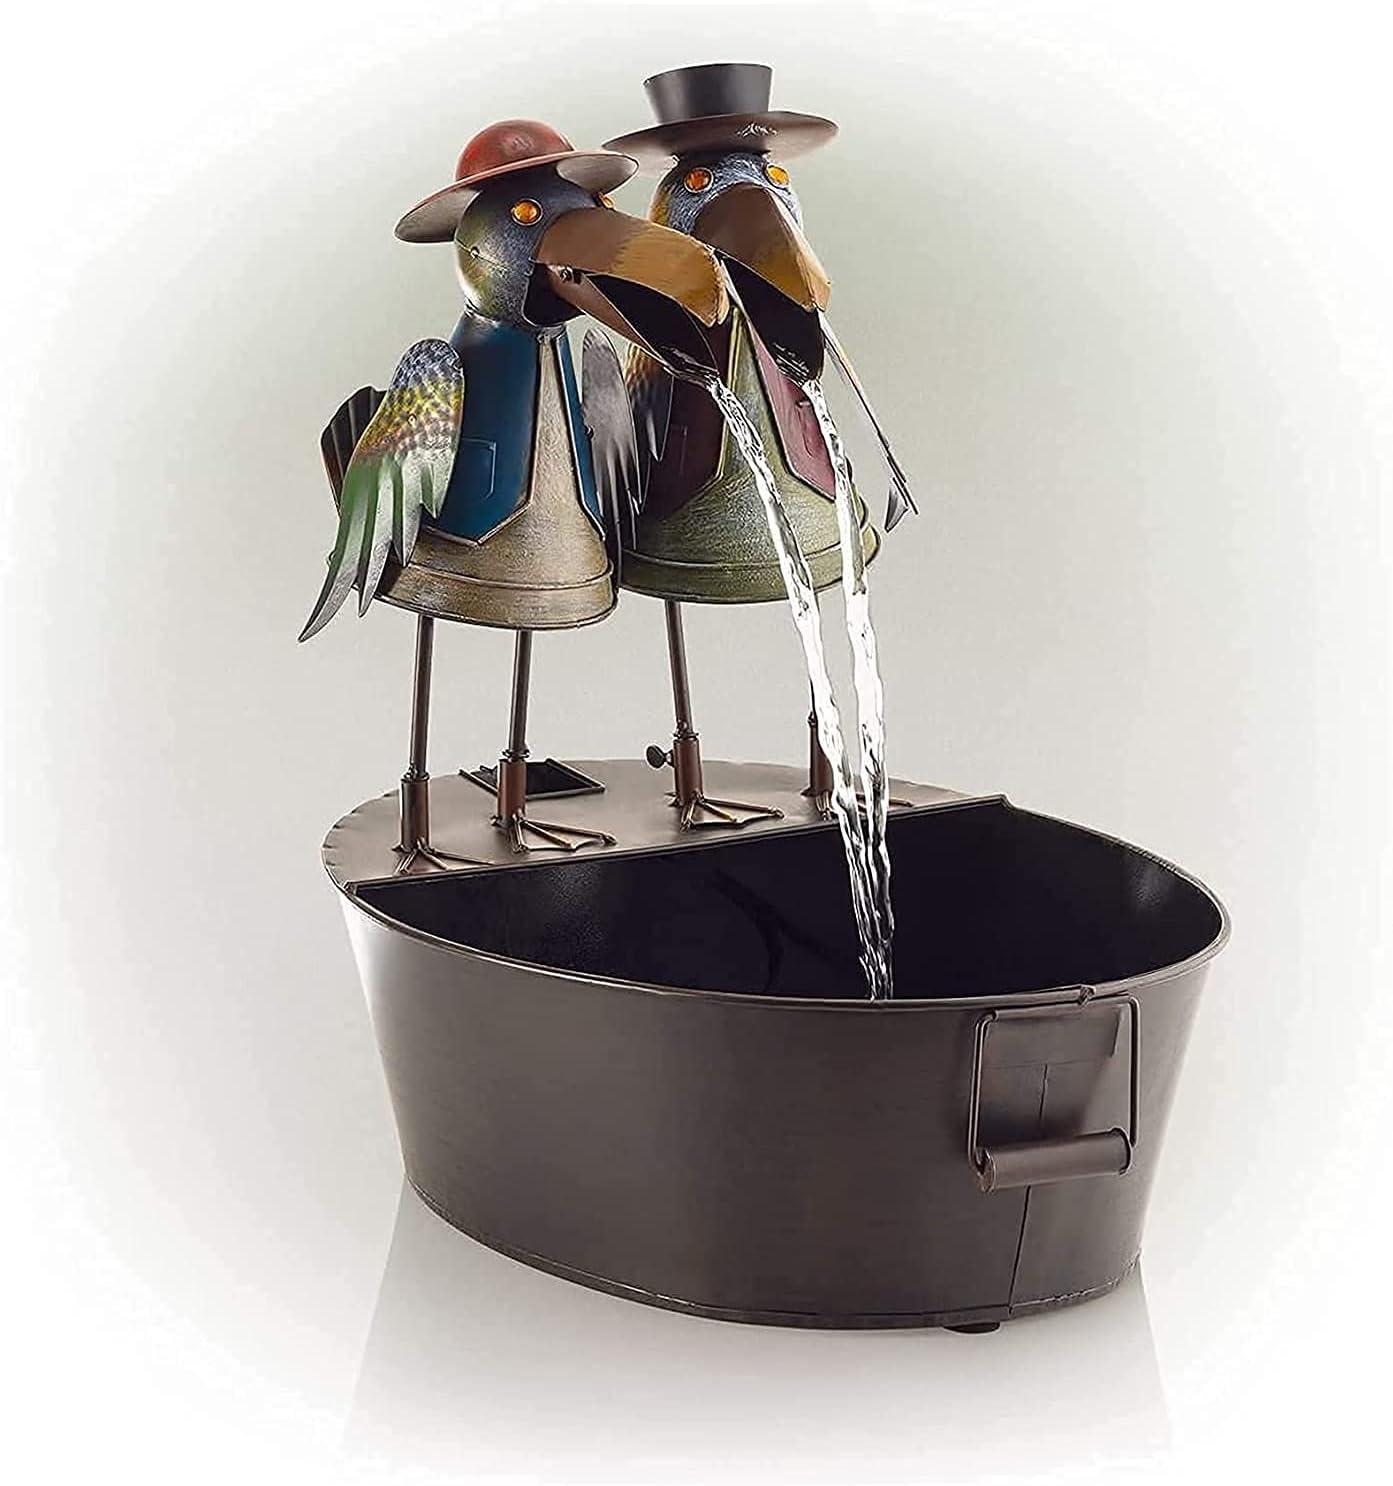 Metal Owl Chicken Crow Fountain Yard Water Art Los Angeles Mall Decor Founta Many popular brands